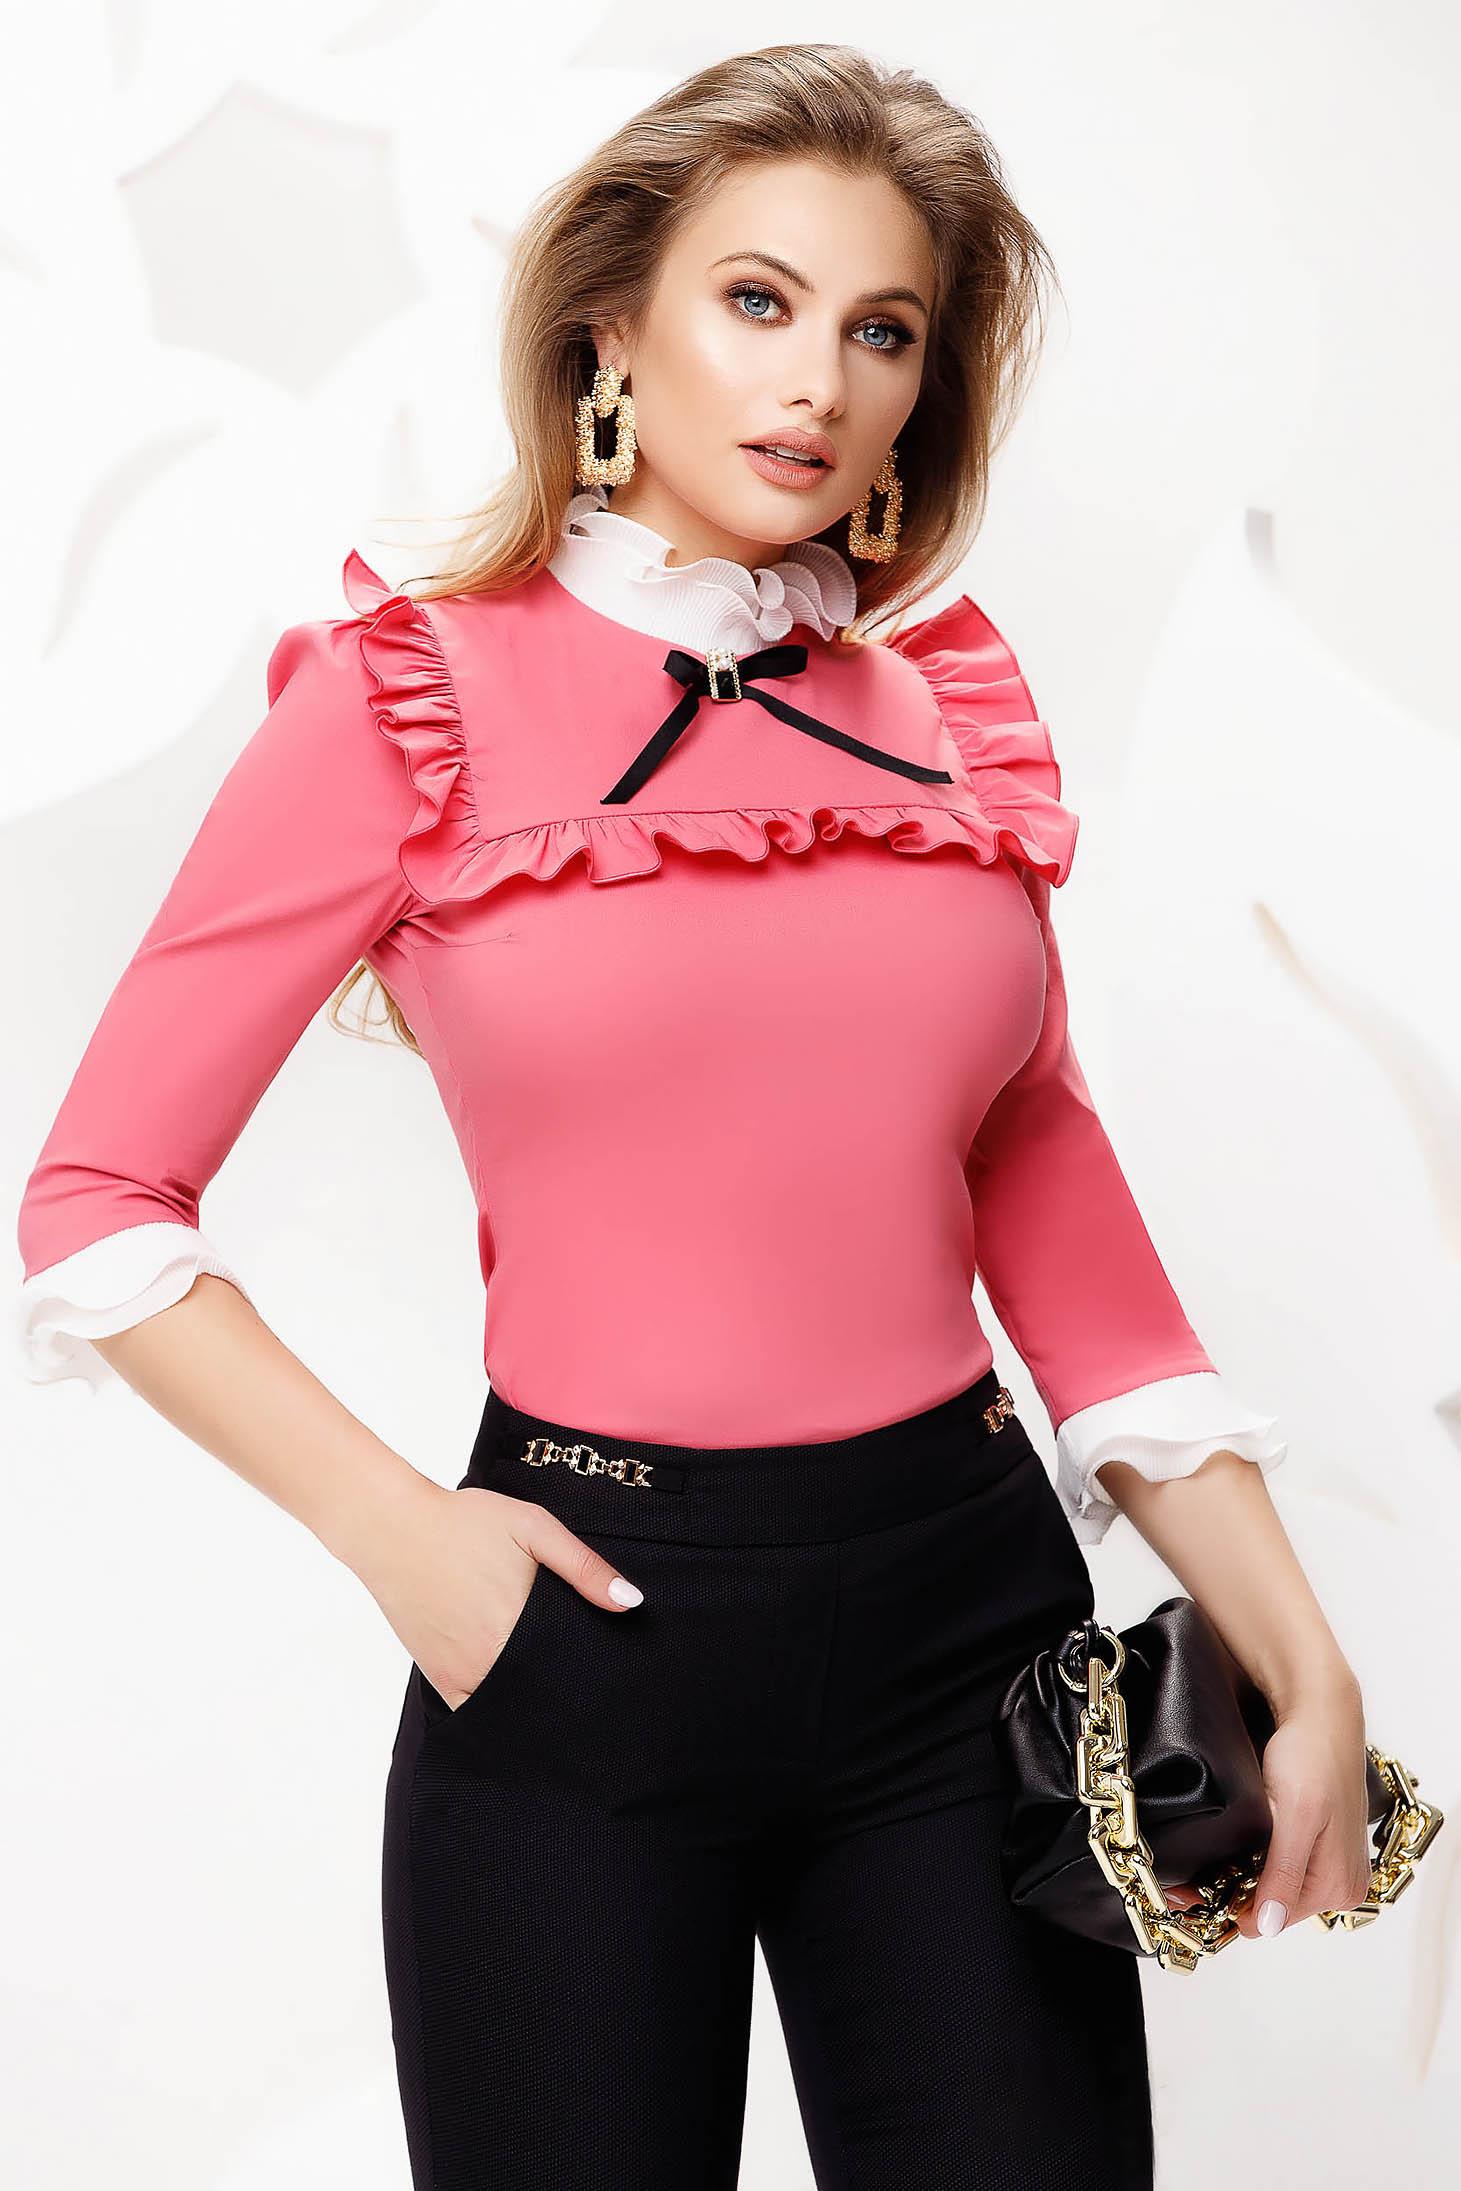 Camasa dama Fofy roz office cambrata din material usor elastic accesorizata cu fundite si volanase